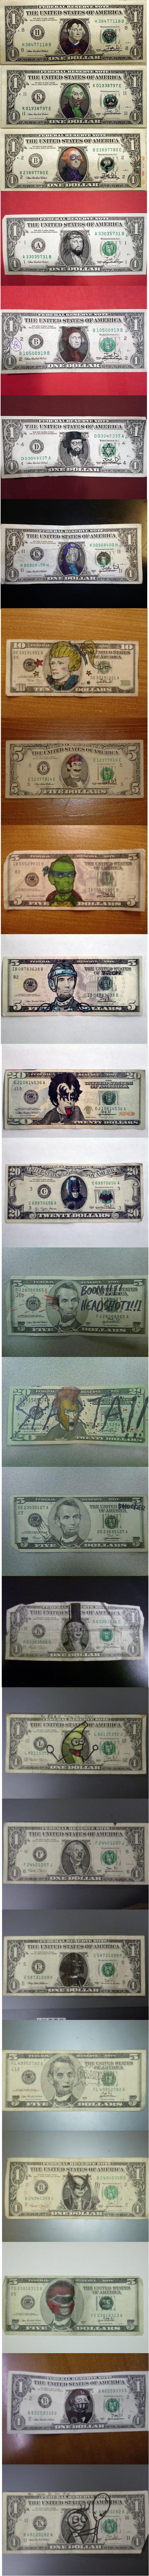 25 best defaced bills. .. aww! What about the boner one? The $1 bill, bONEr. xDD I still think its funny.. 25 best defaced bills aww! What about the boner one? The $1 bill bONEr xDD I still think its funny